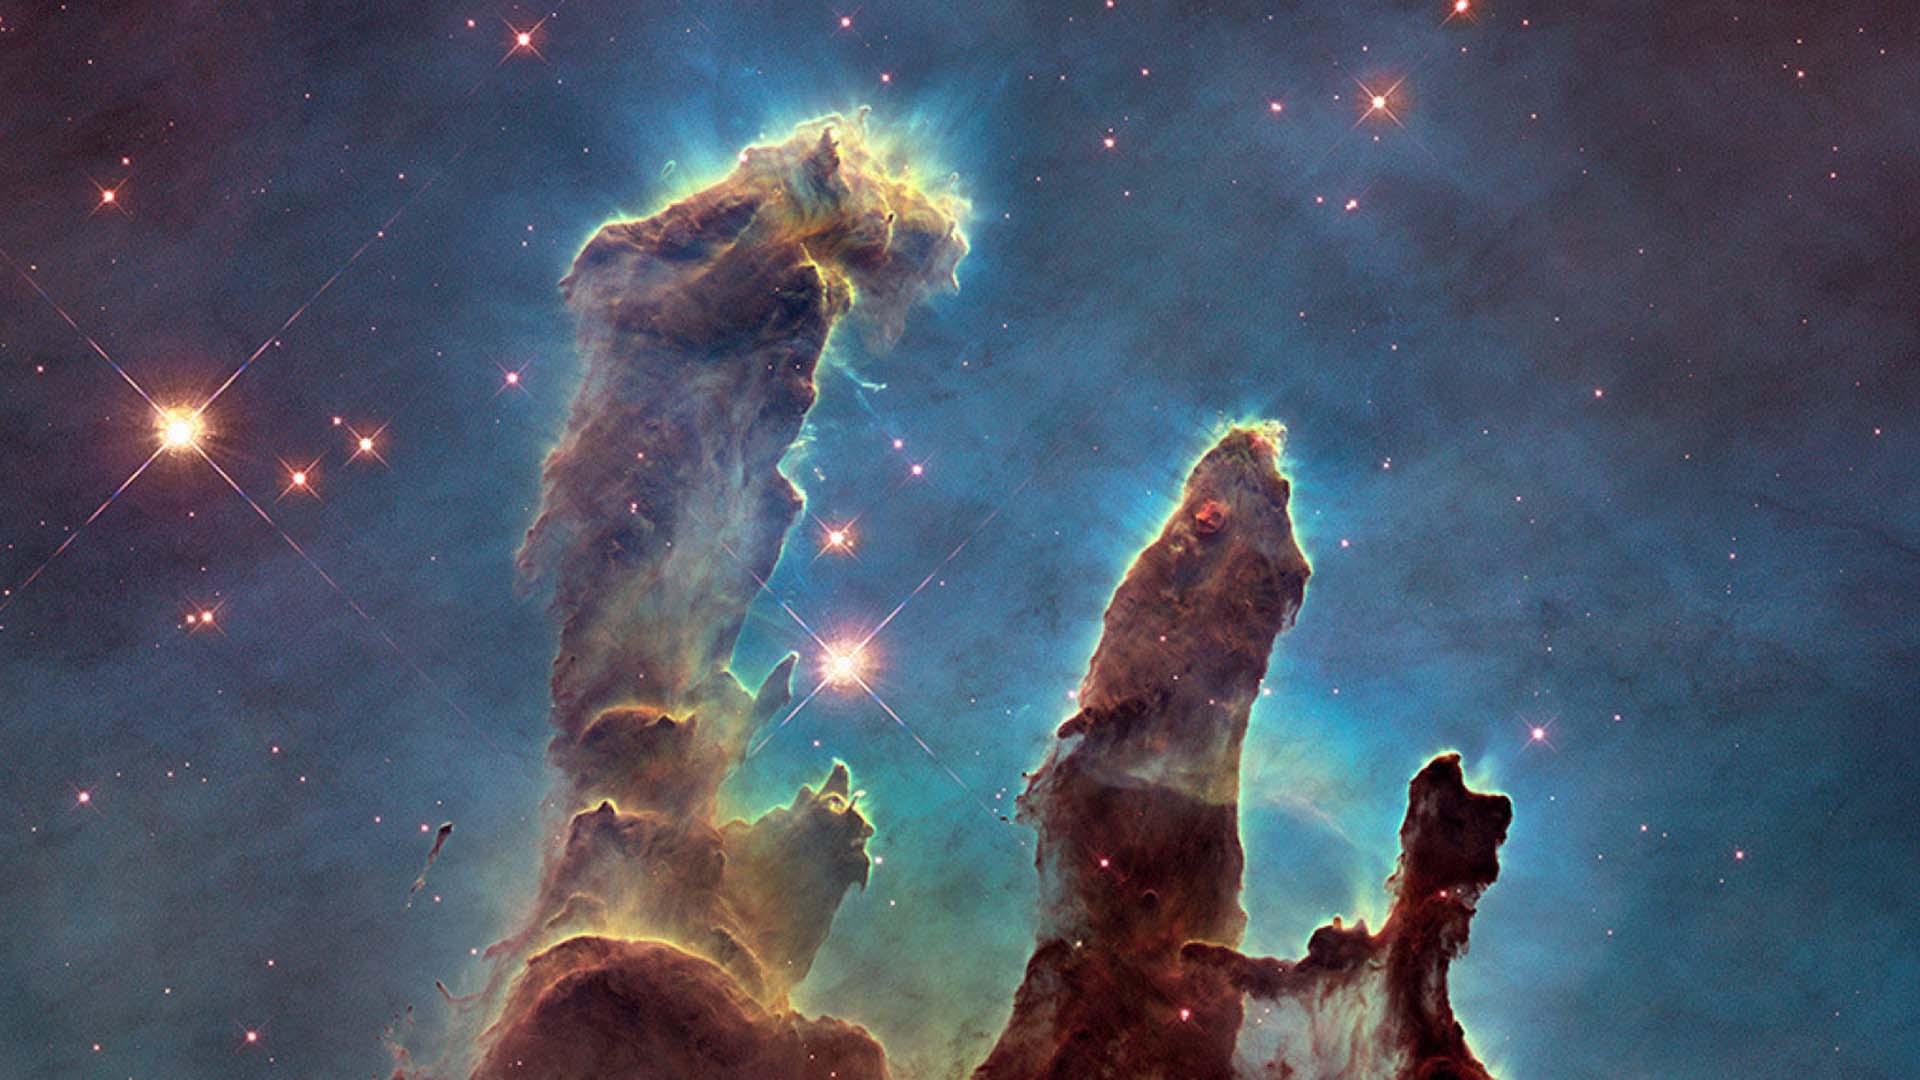 Pillars of Creation - Feature Image